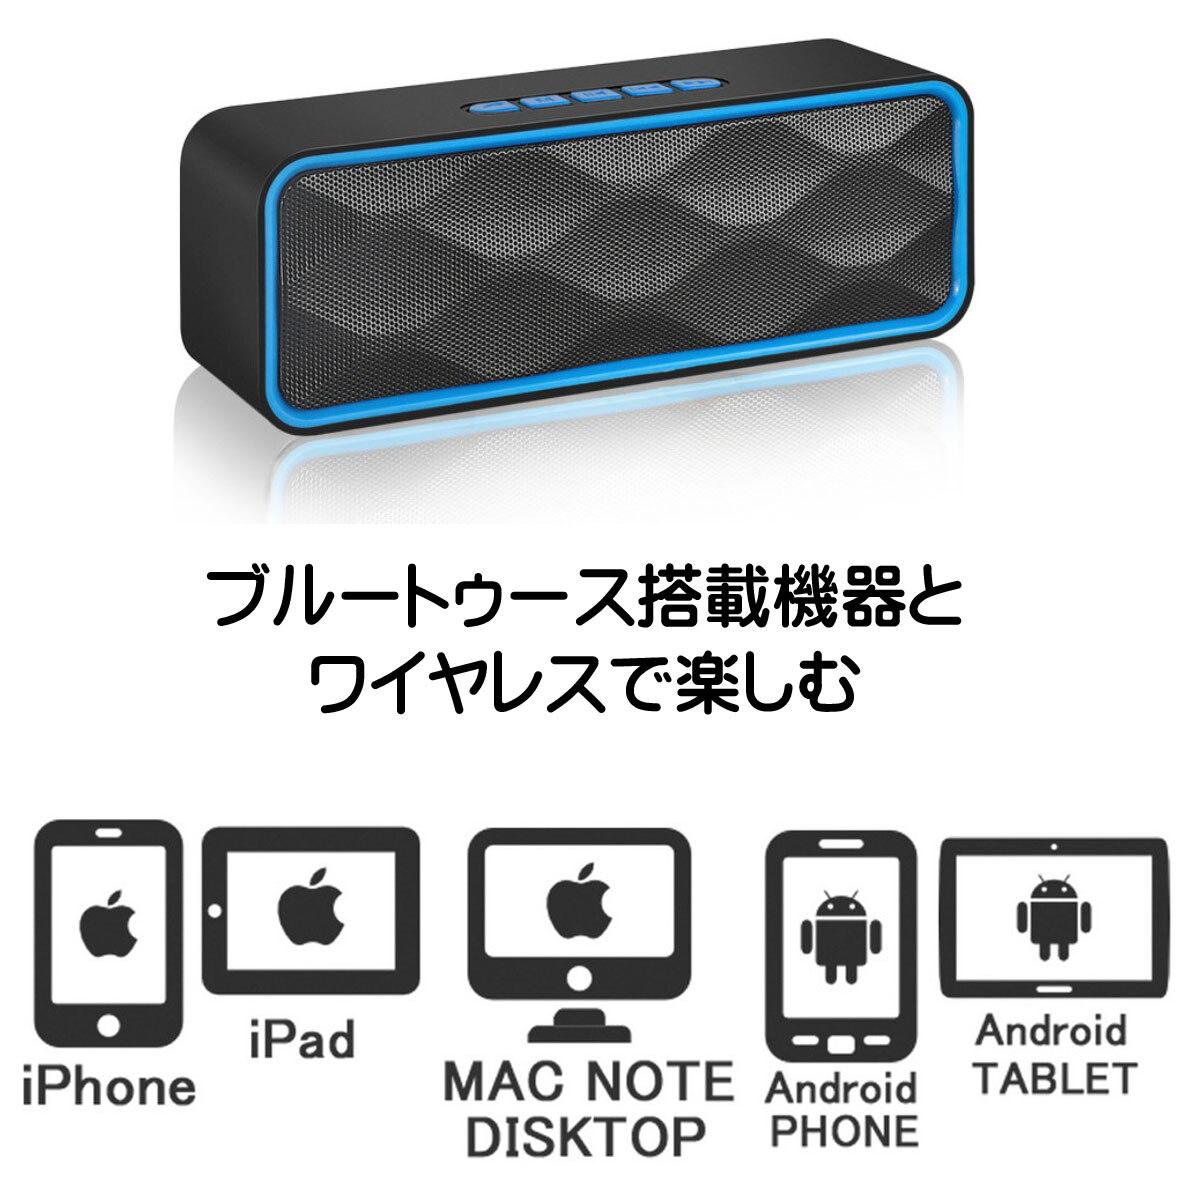 [New]Plural two AGM Bluetooth Bluetooth speakers simultaneous connection FM  Radio koonshitsujuteionshitsunaishashokatayagairyoko iphone ipod mac pc